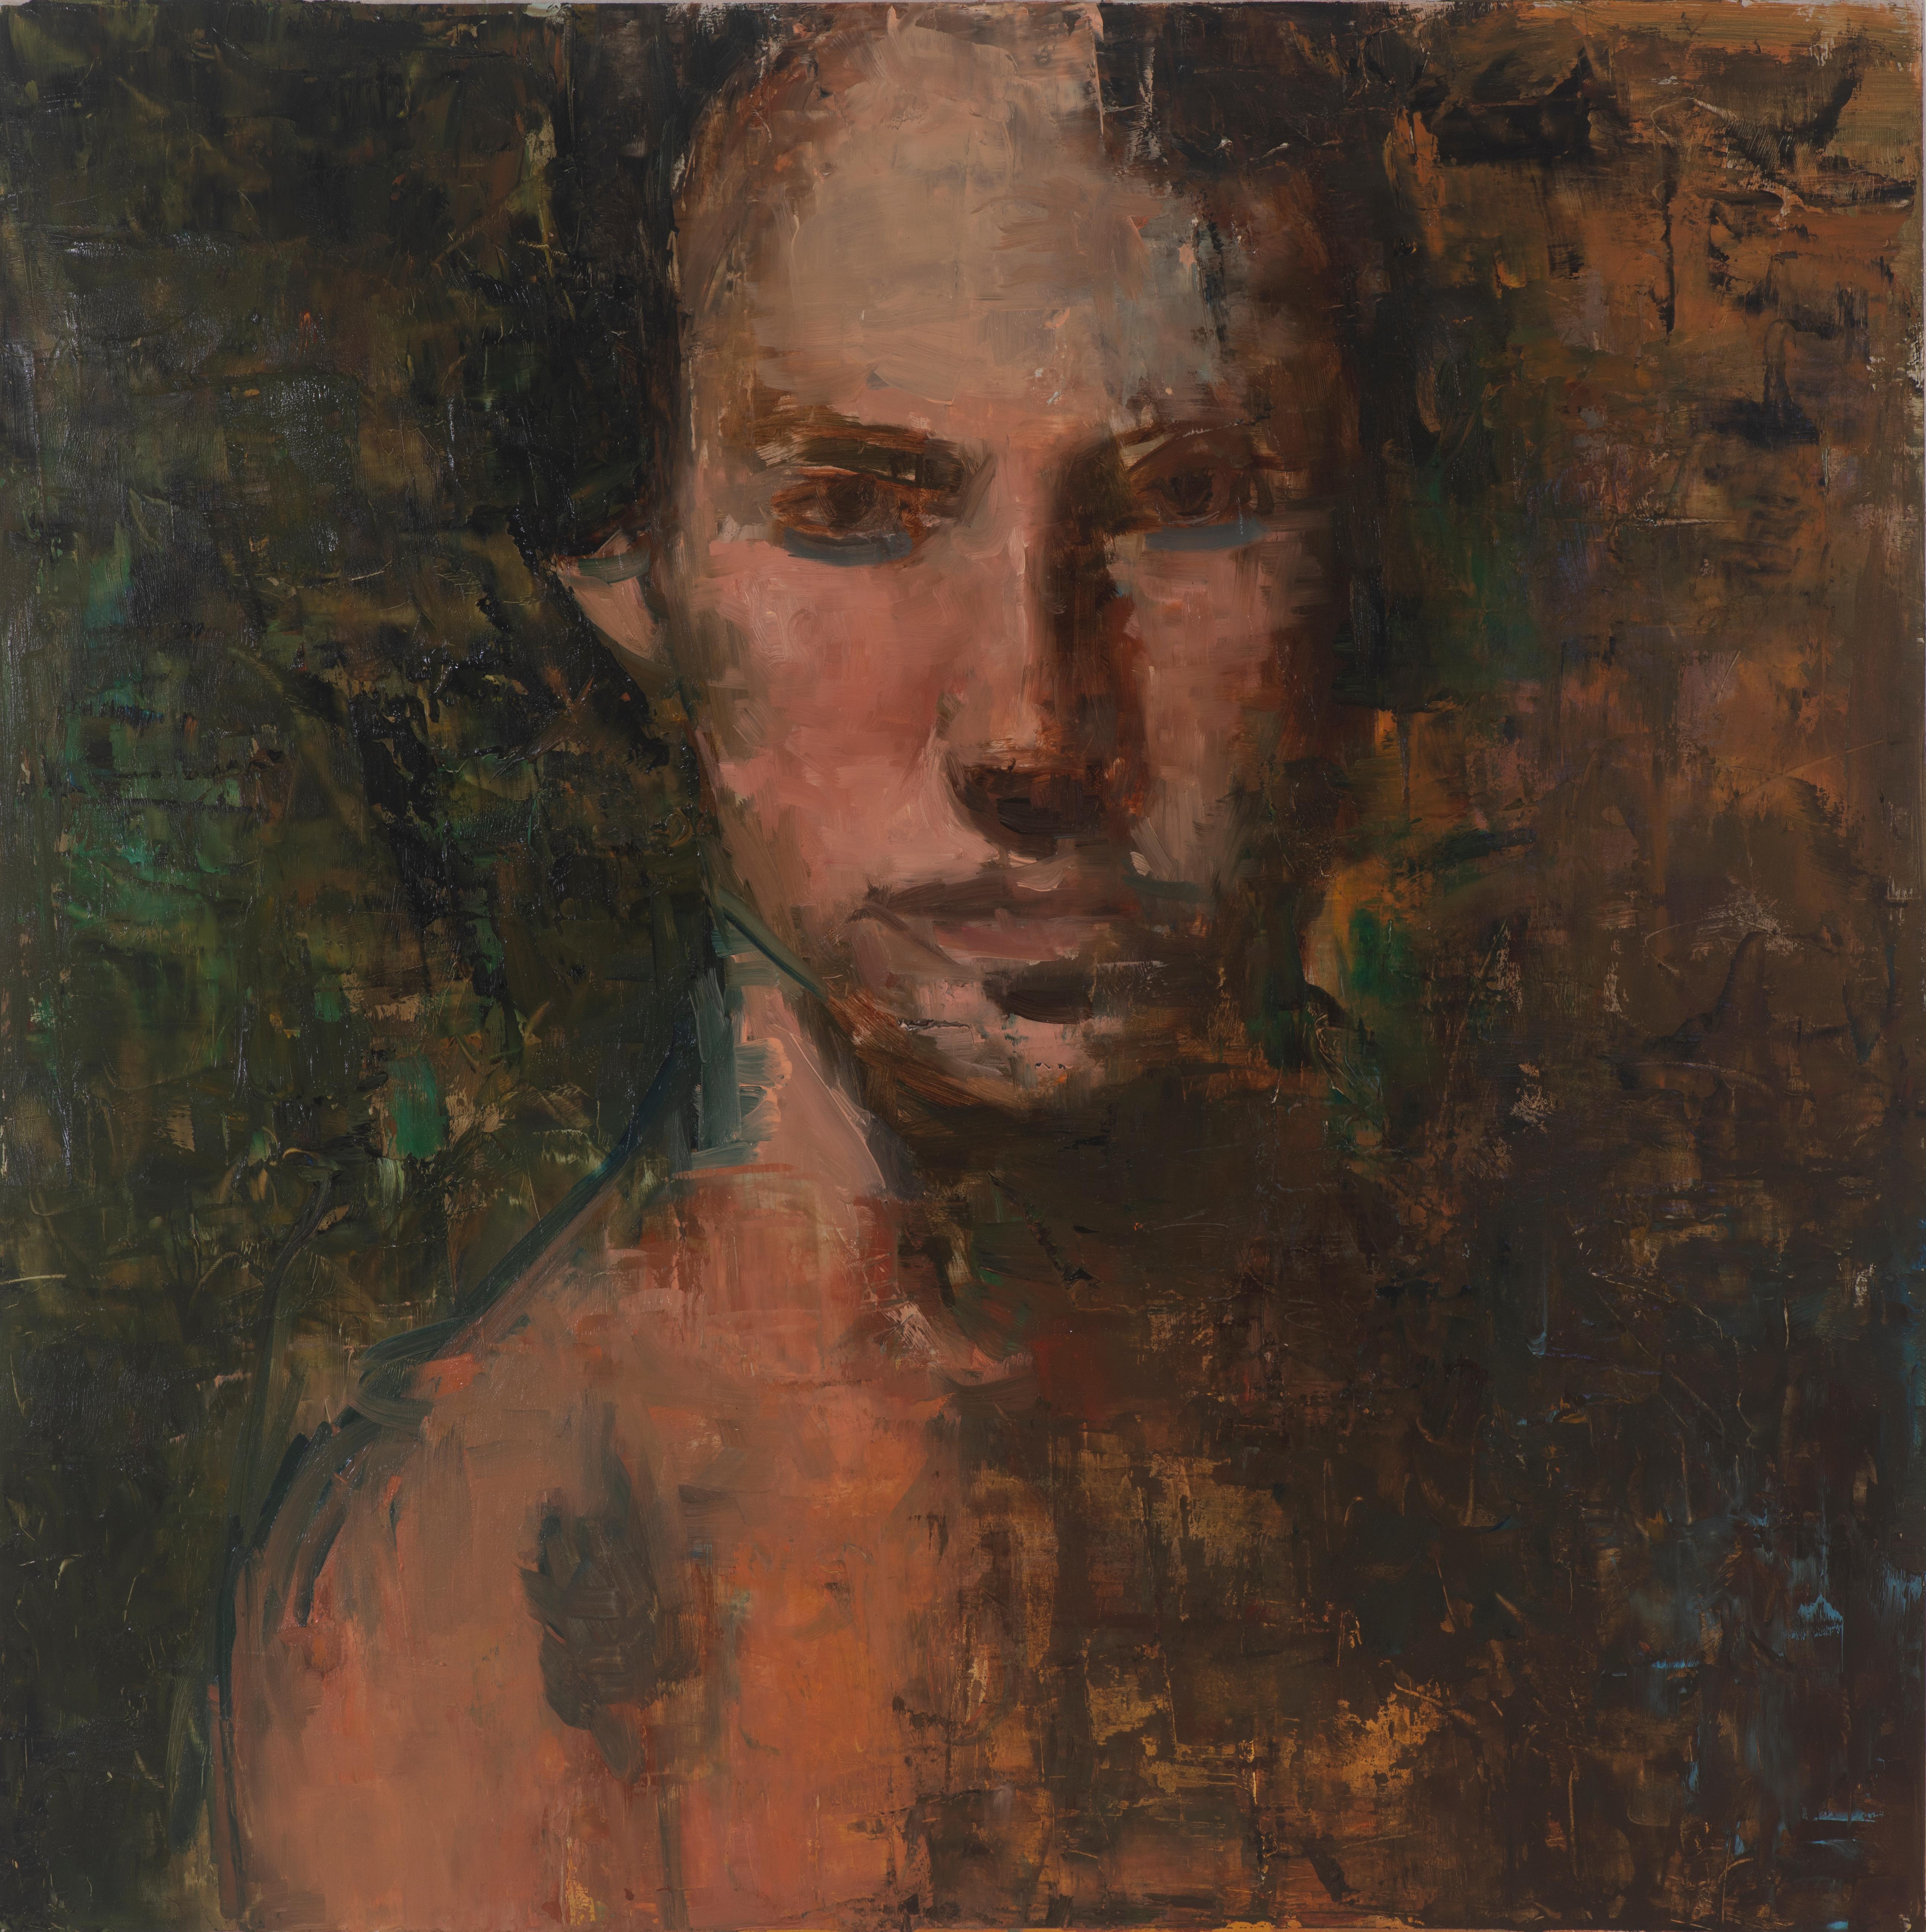 I AM/ androgynous head mixed media oil painting